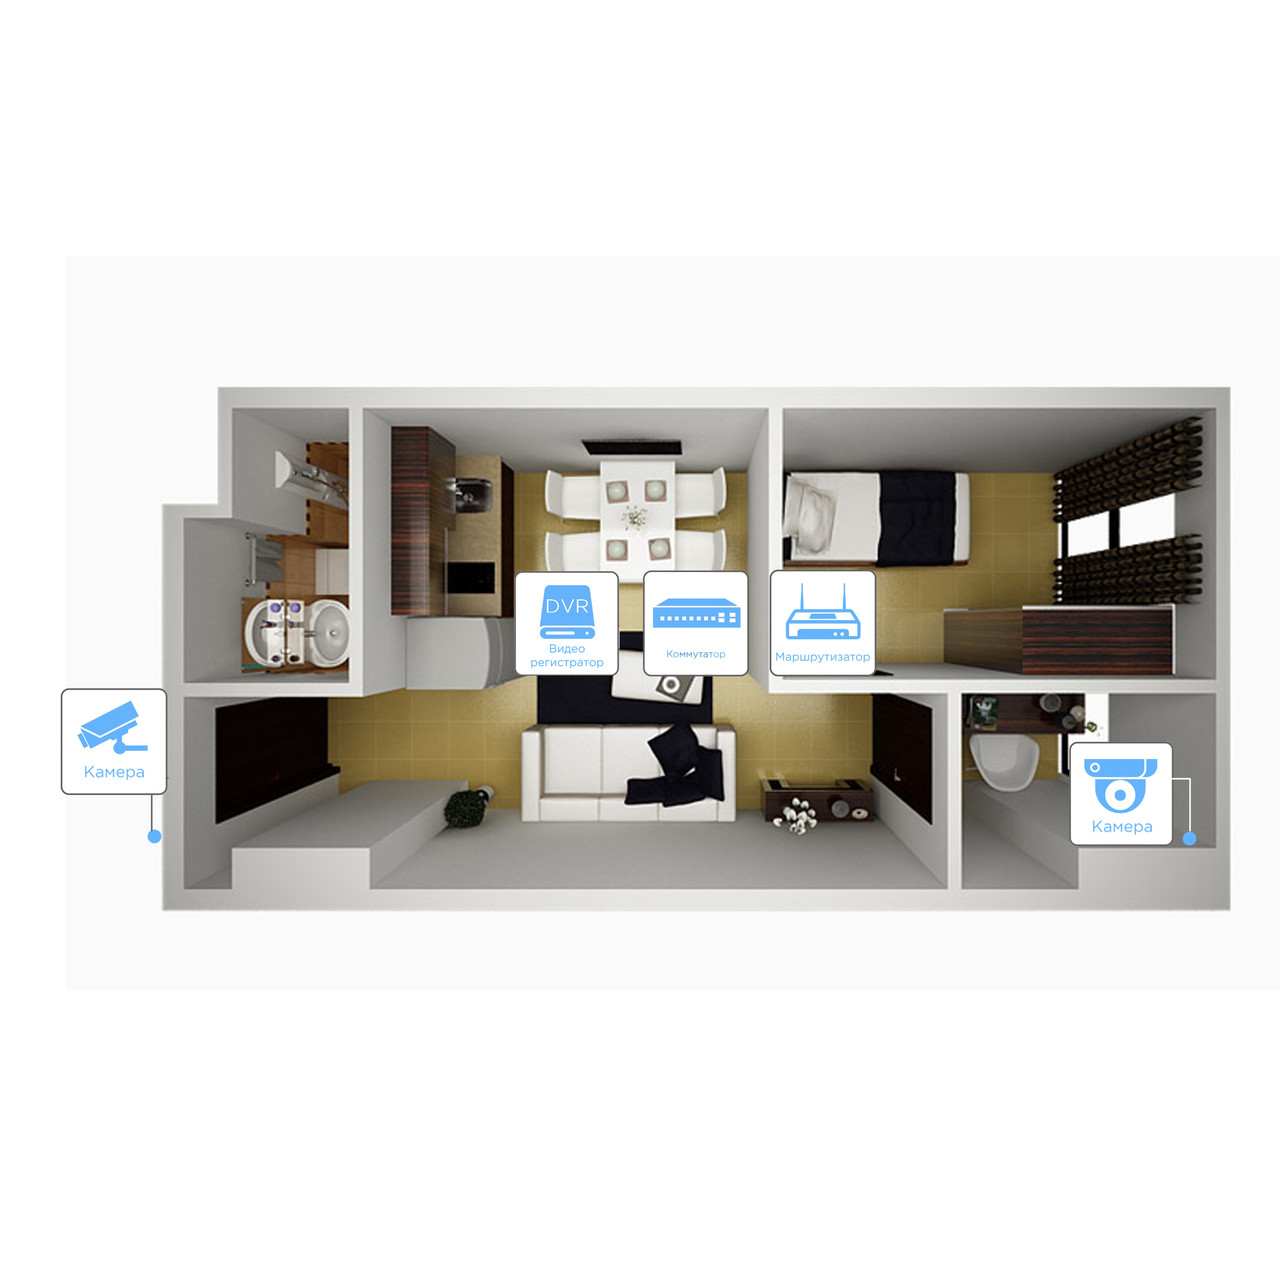 IP видеонаблюдение 2 камеры (4Мп) для квартиры